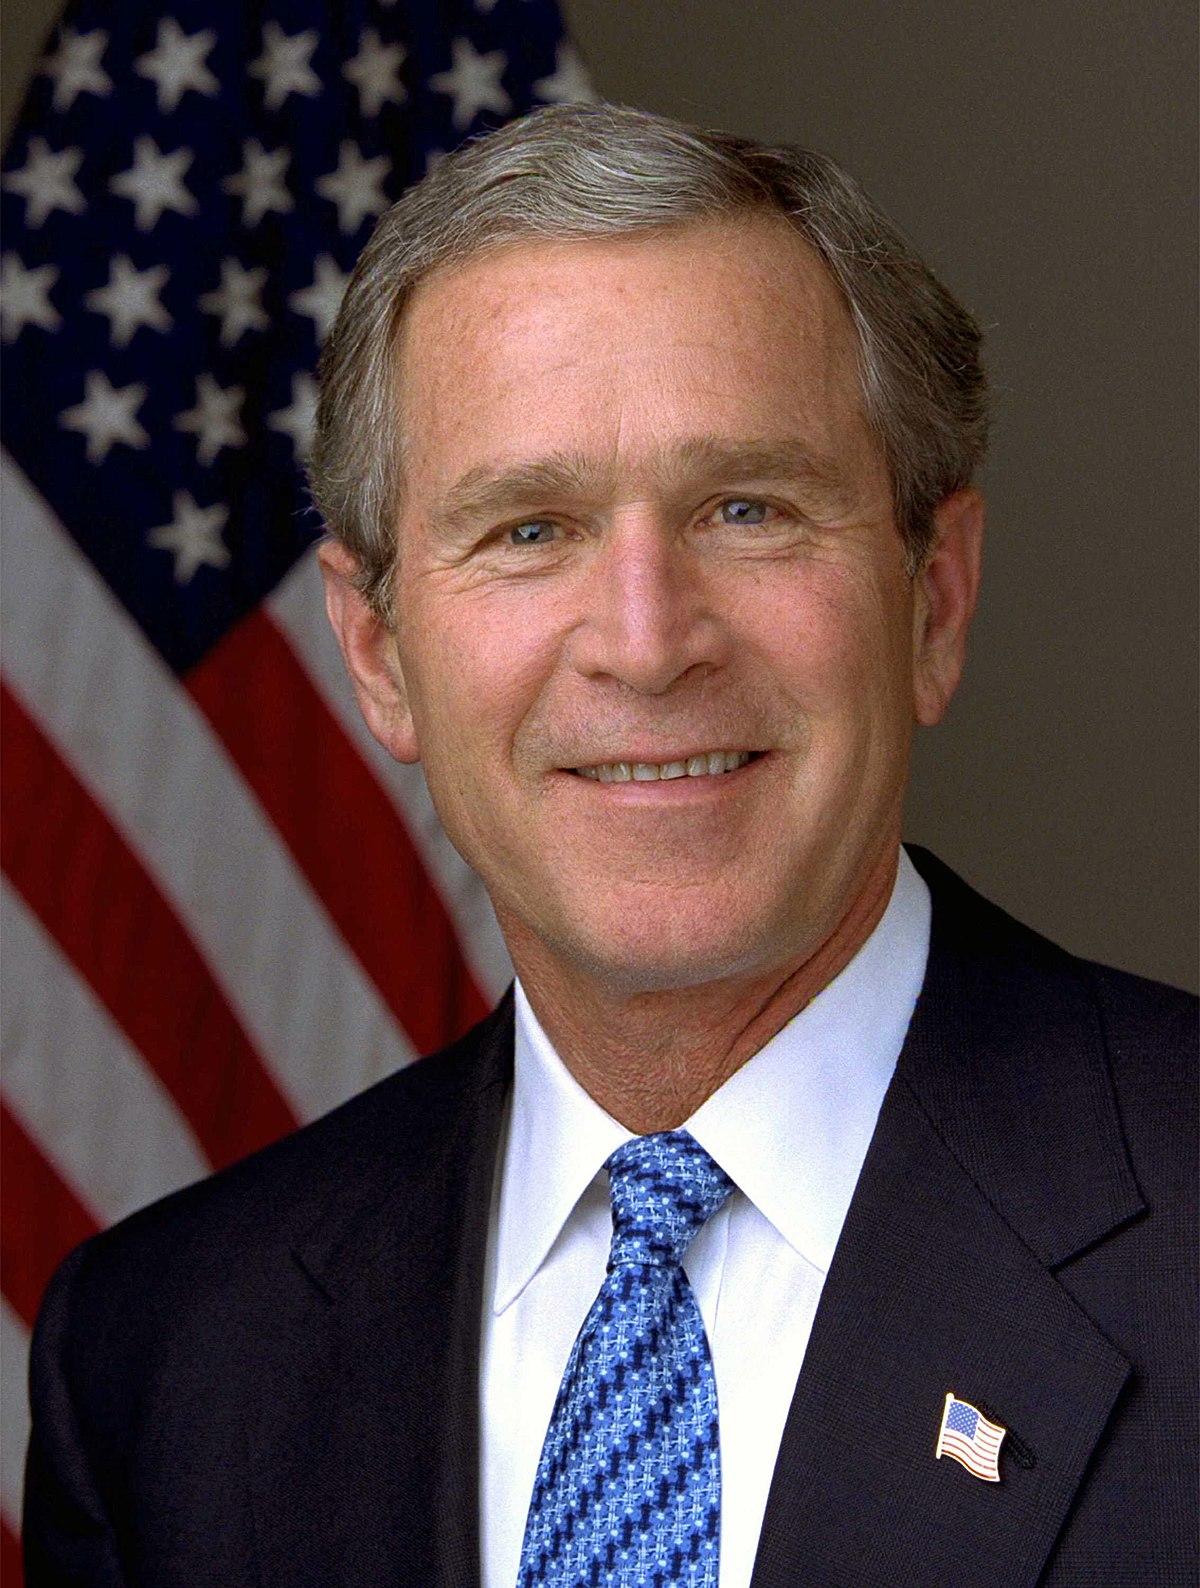 President Bush on Terri Schiavo